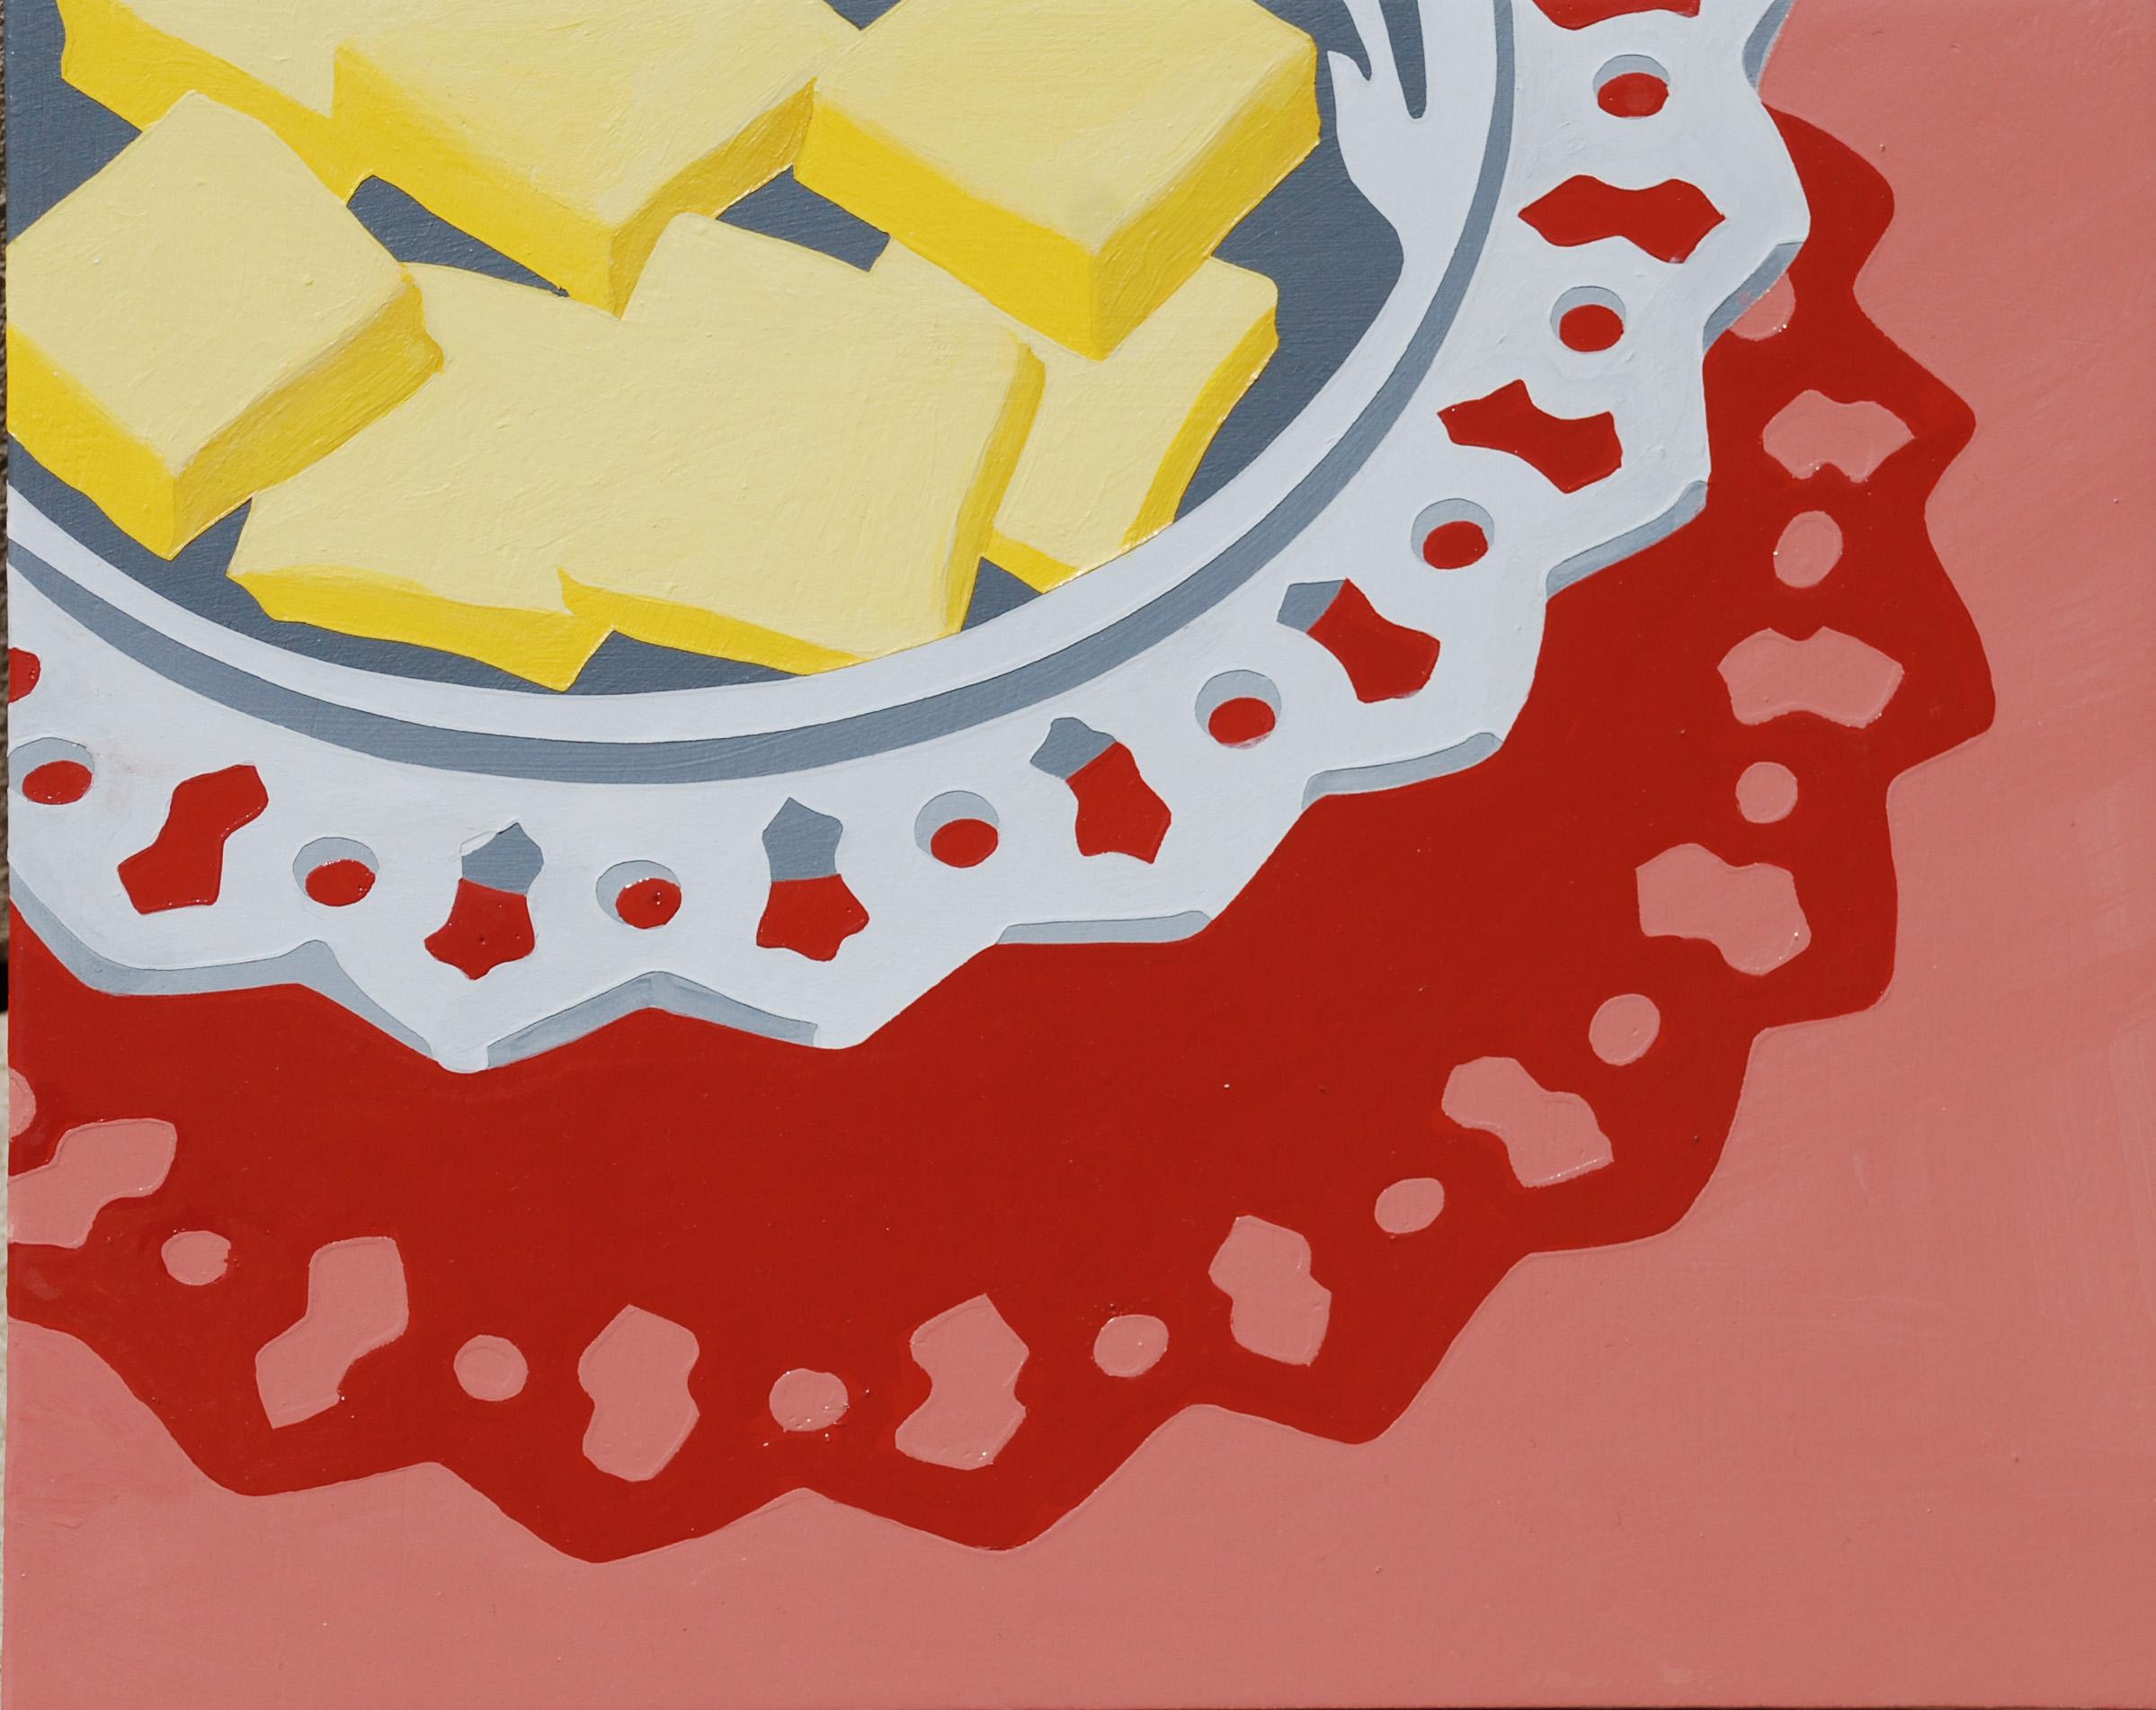 25_butter-padsOnDish.jpg